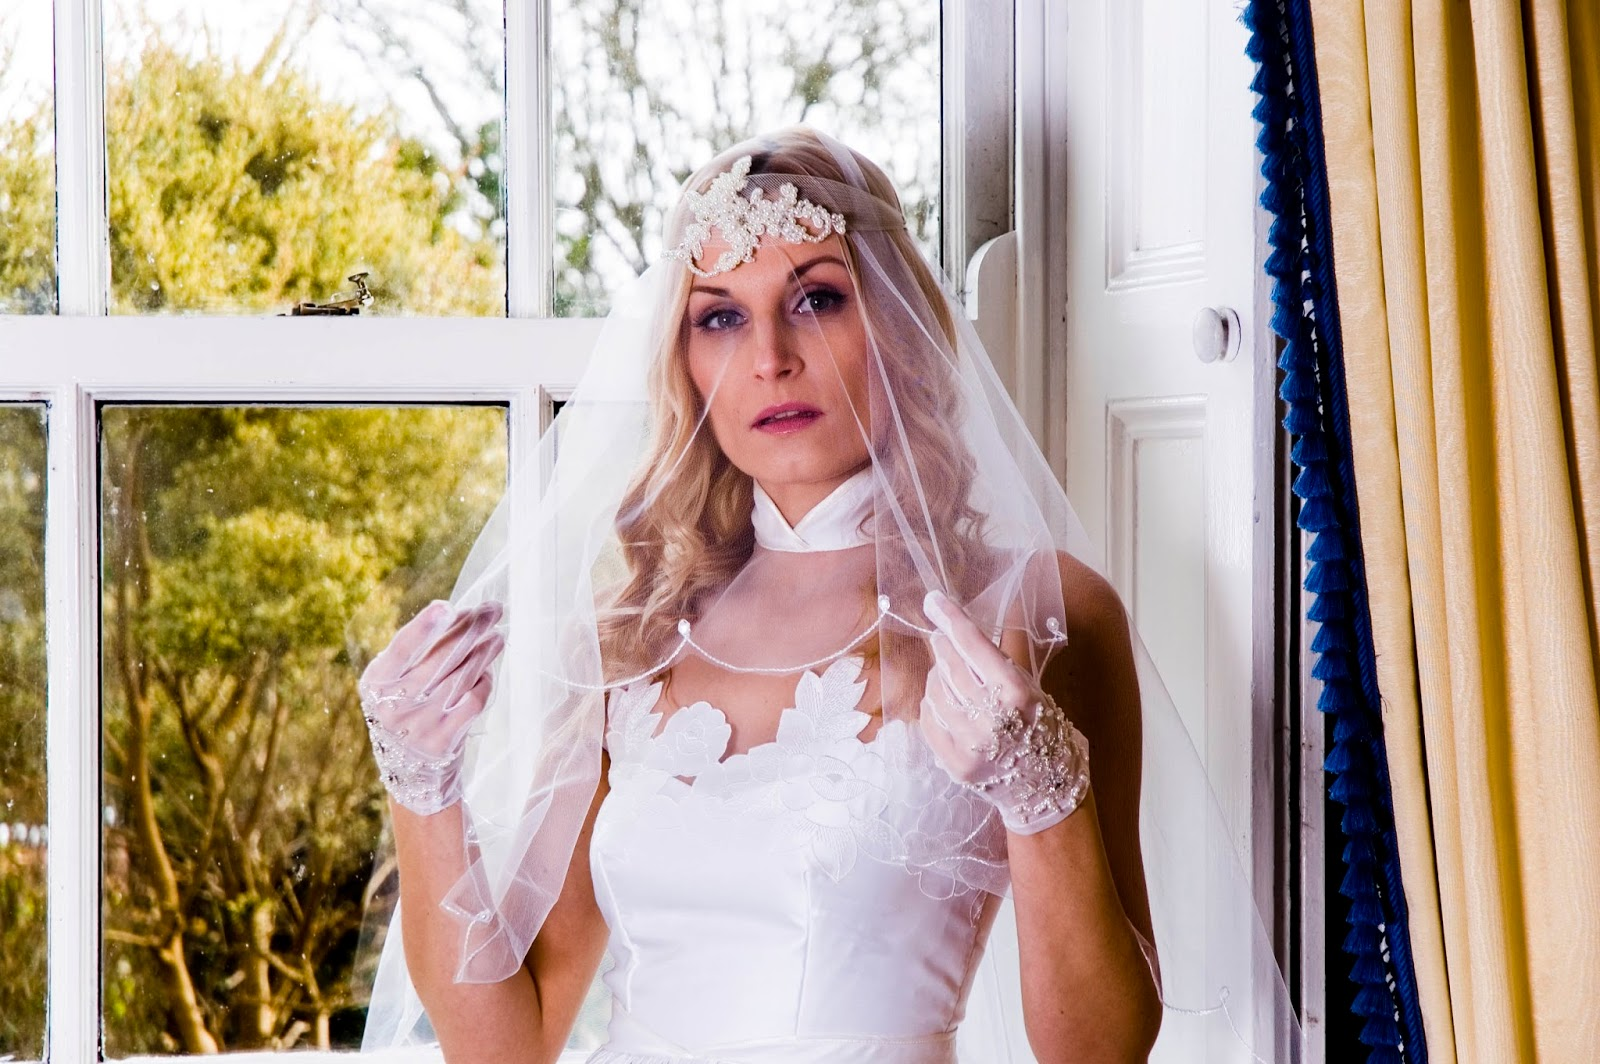 Modern dress advantages - The Advantages Of Buying A Vintage Wedding Dress